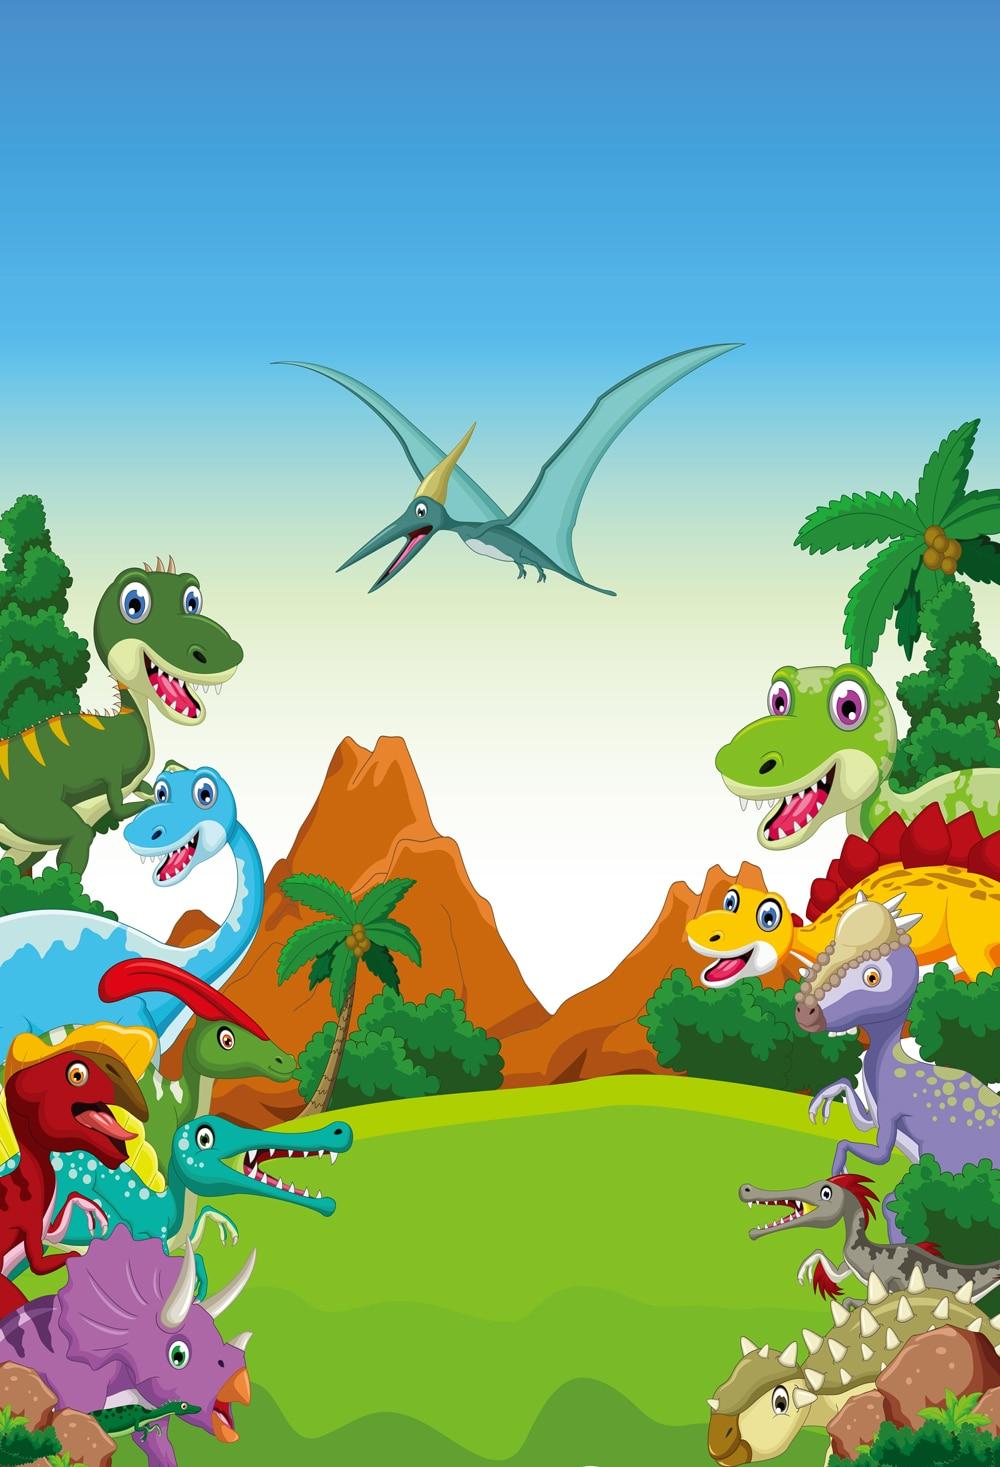 Baby Birthday Photography Backdrop Photobooth Background Cartoon Jungle Dinosaur Wall Decoration Xt 6717 Huayi Background Aliexpress